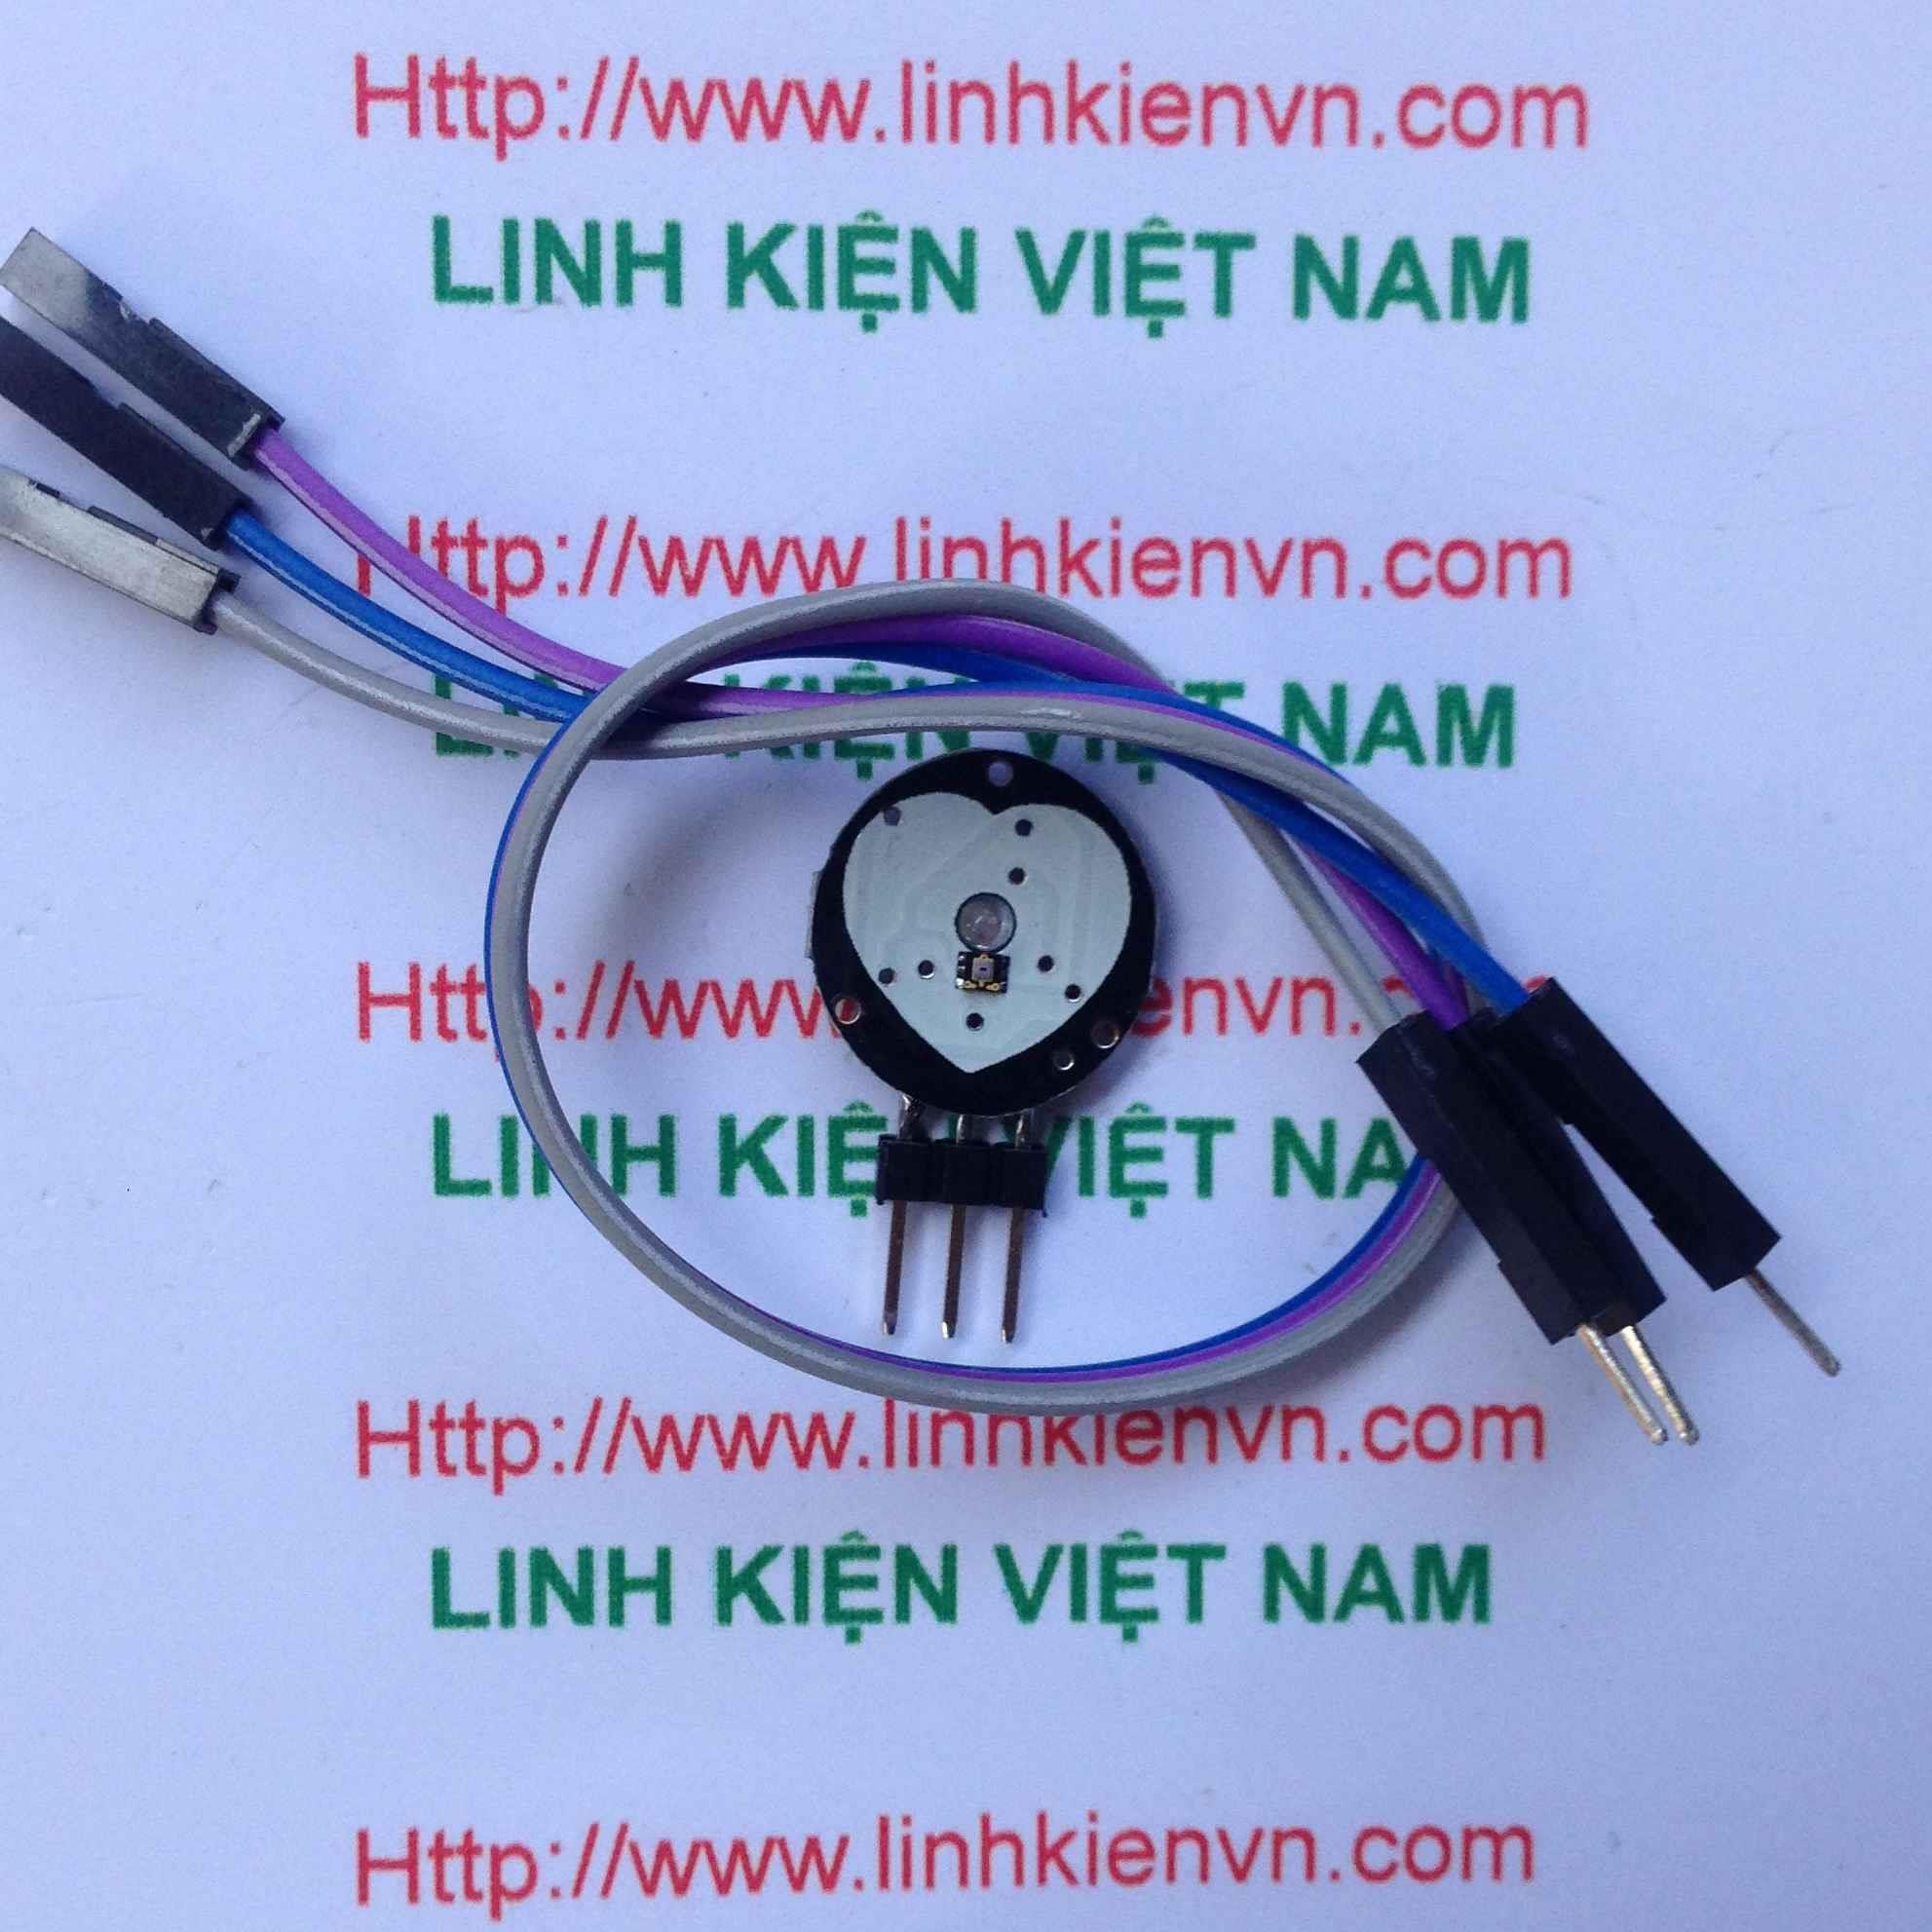 Module cảm biến nhịp tim / Mạch đo nhịp tim - G3H17